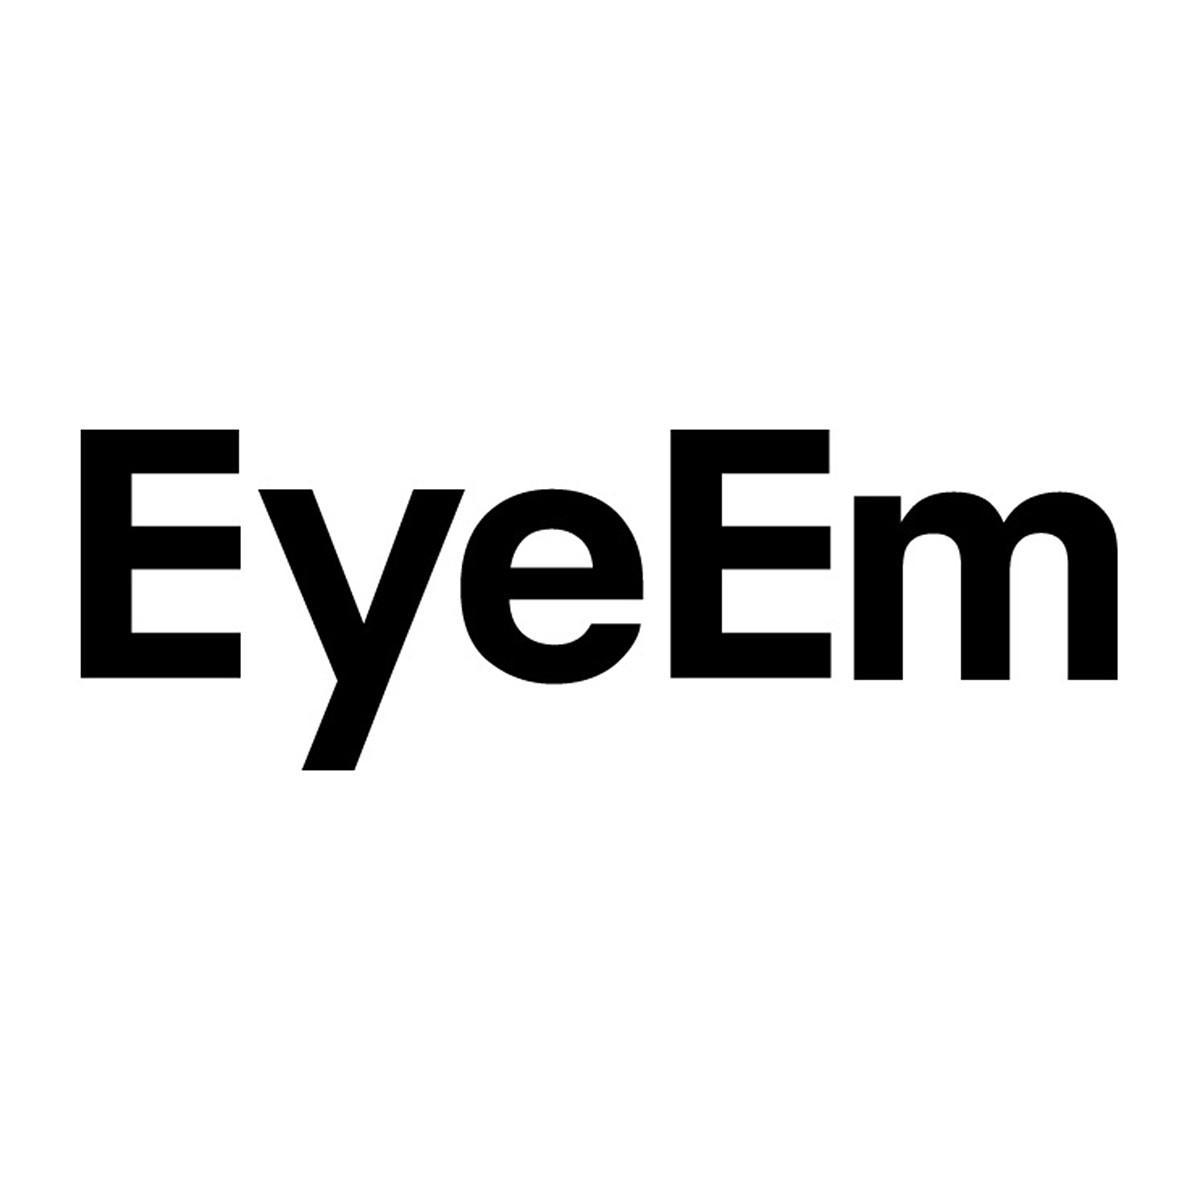 EyeEm company logo